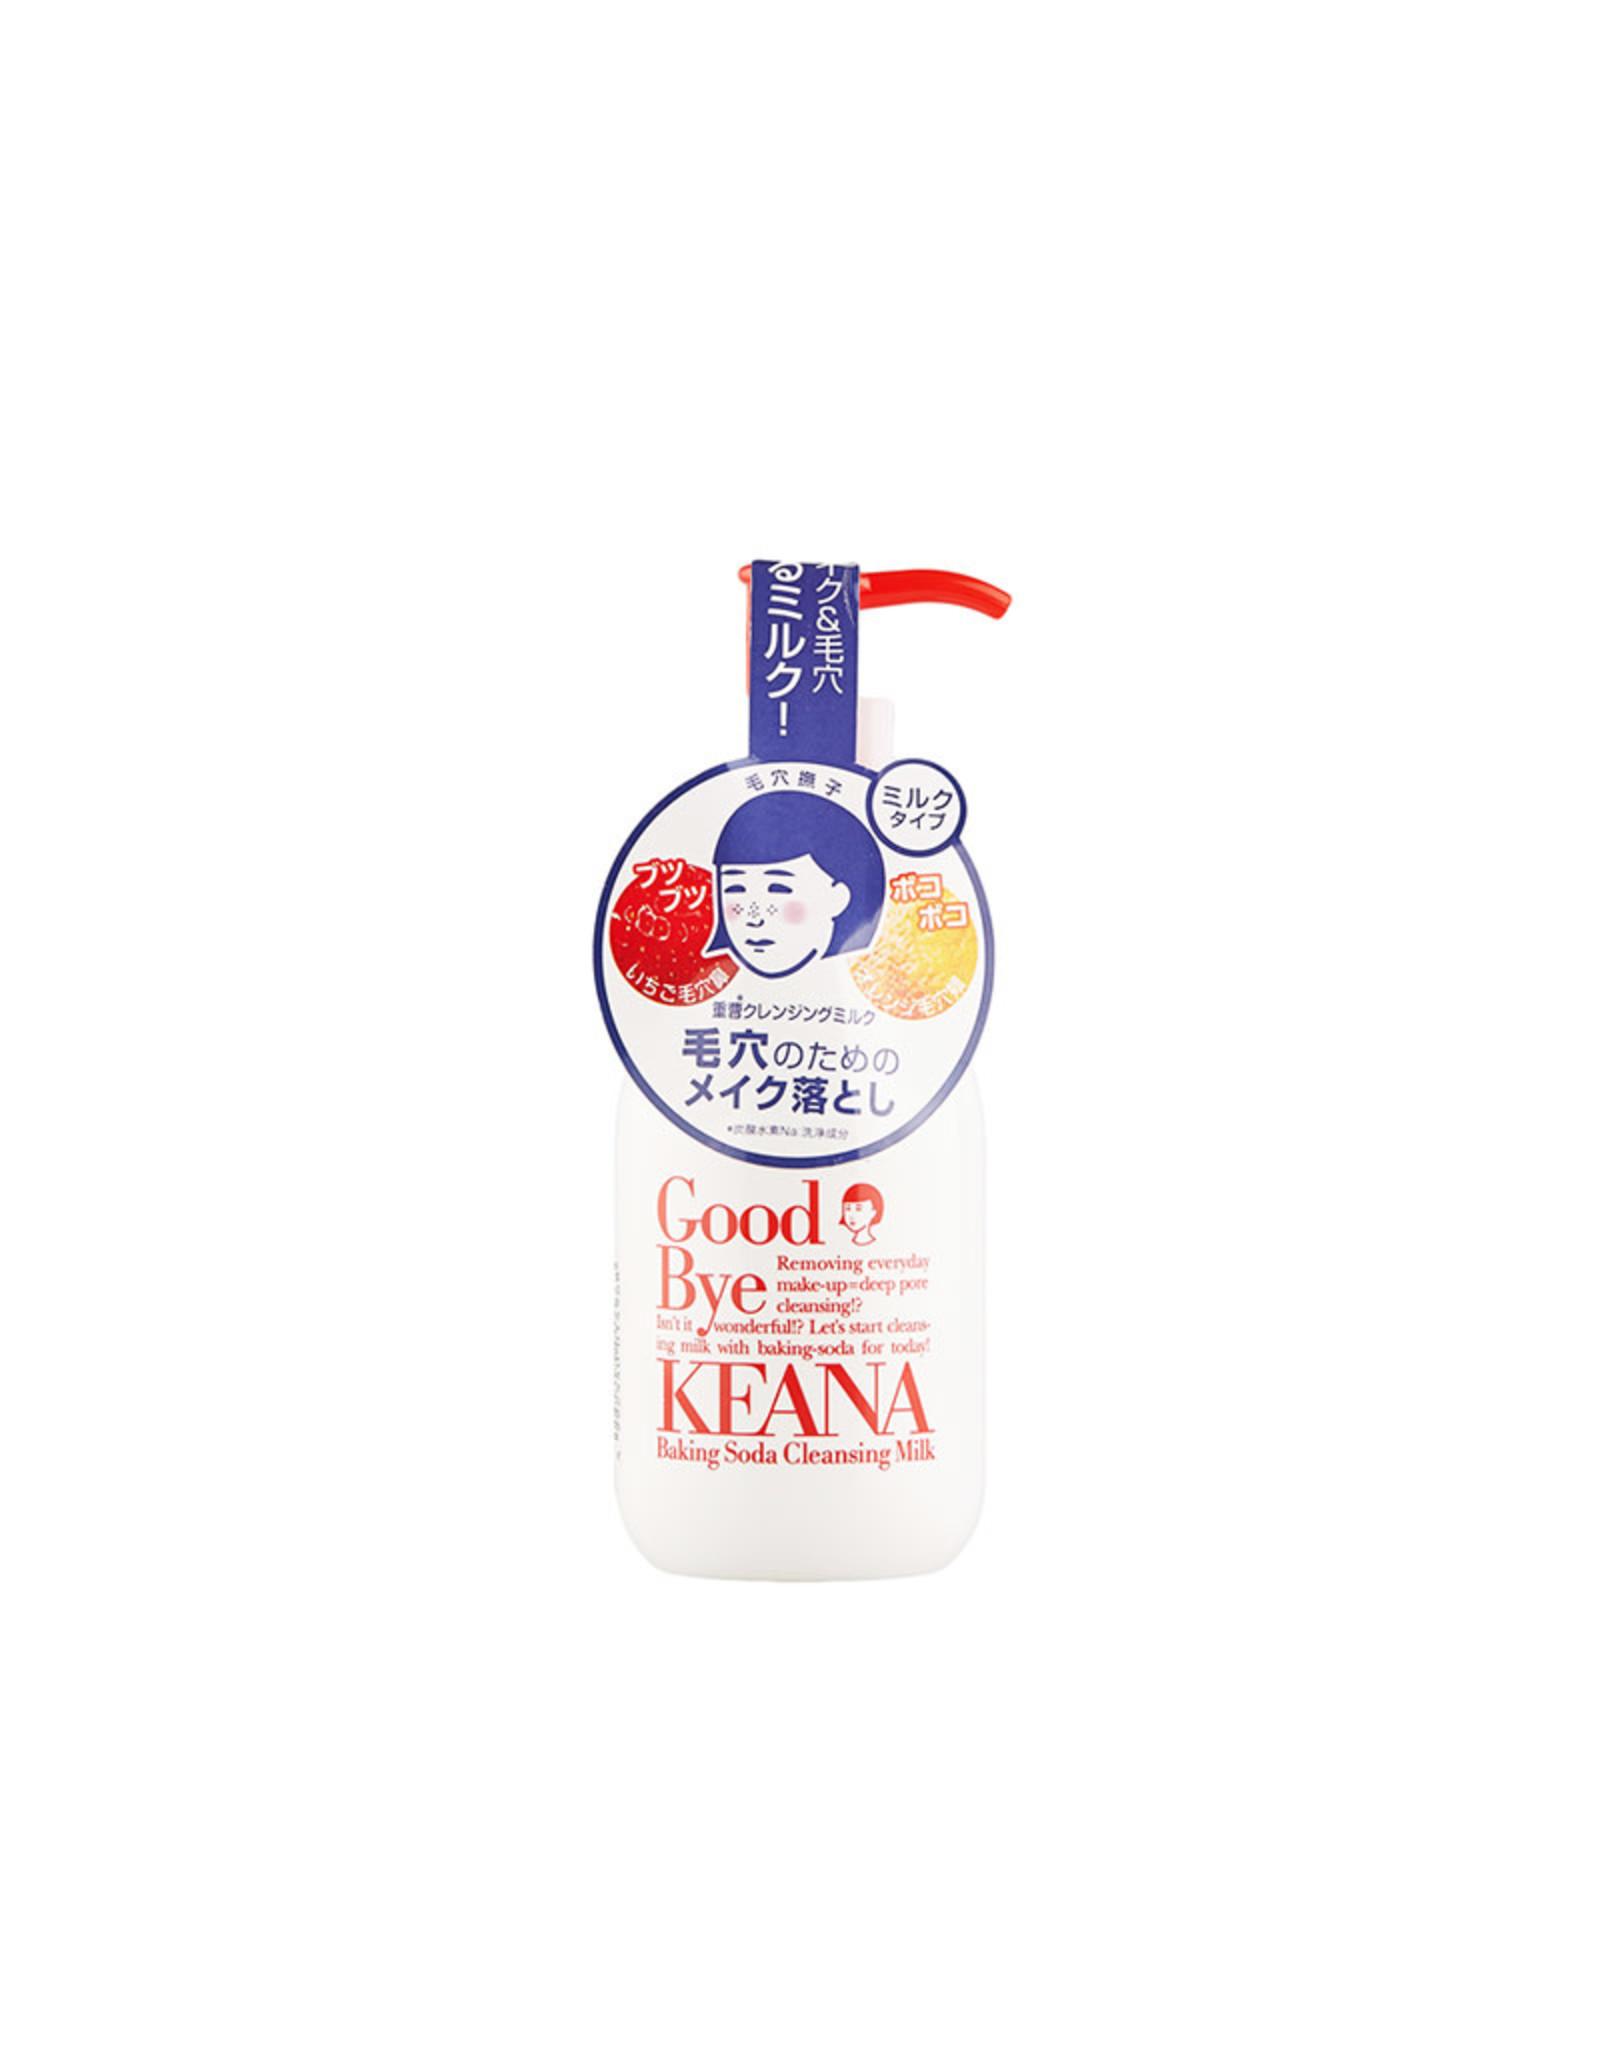 Ishizawa Lab Ishizawa Keana Nadeshiko Baking Soda Cleansing Milk 150ml